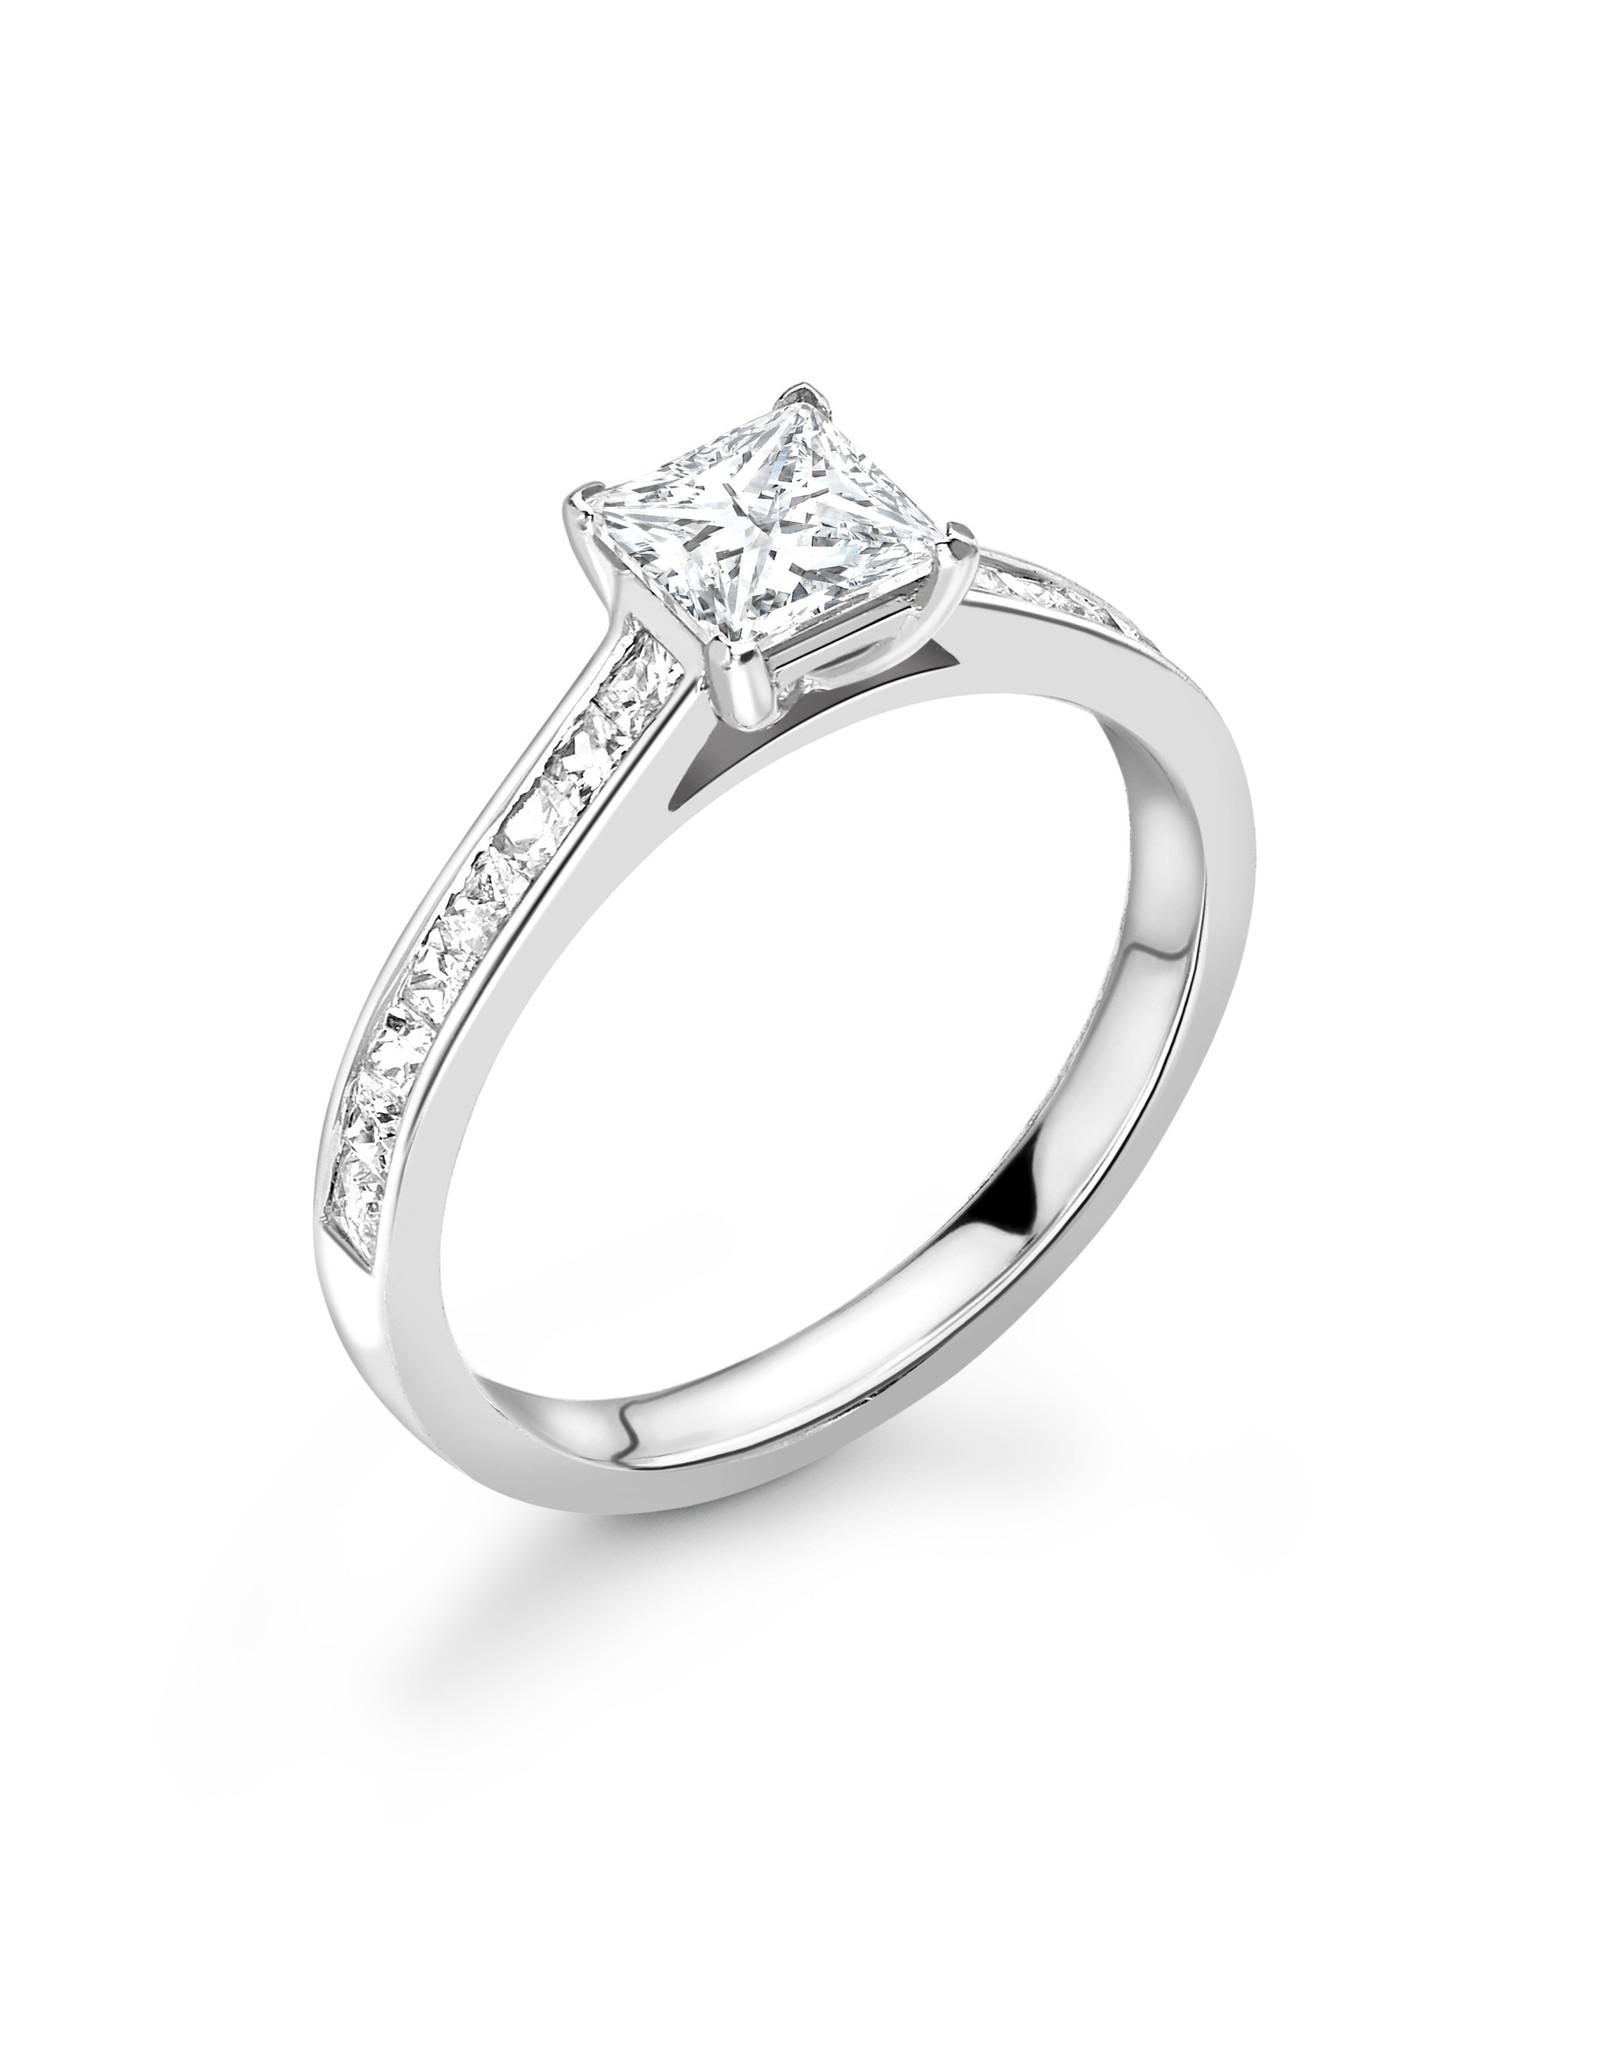 LVN Princesse Verlovingsring Met Zijsteentjes LVNRX3223